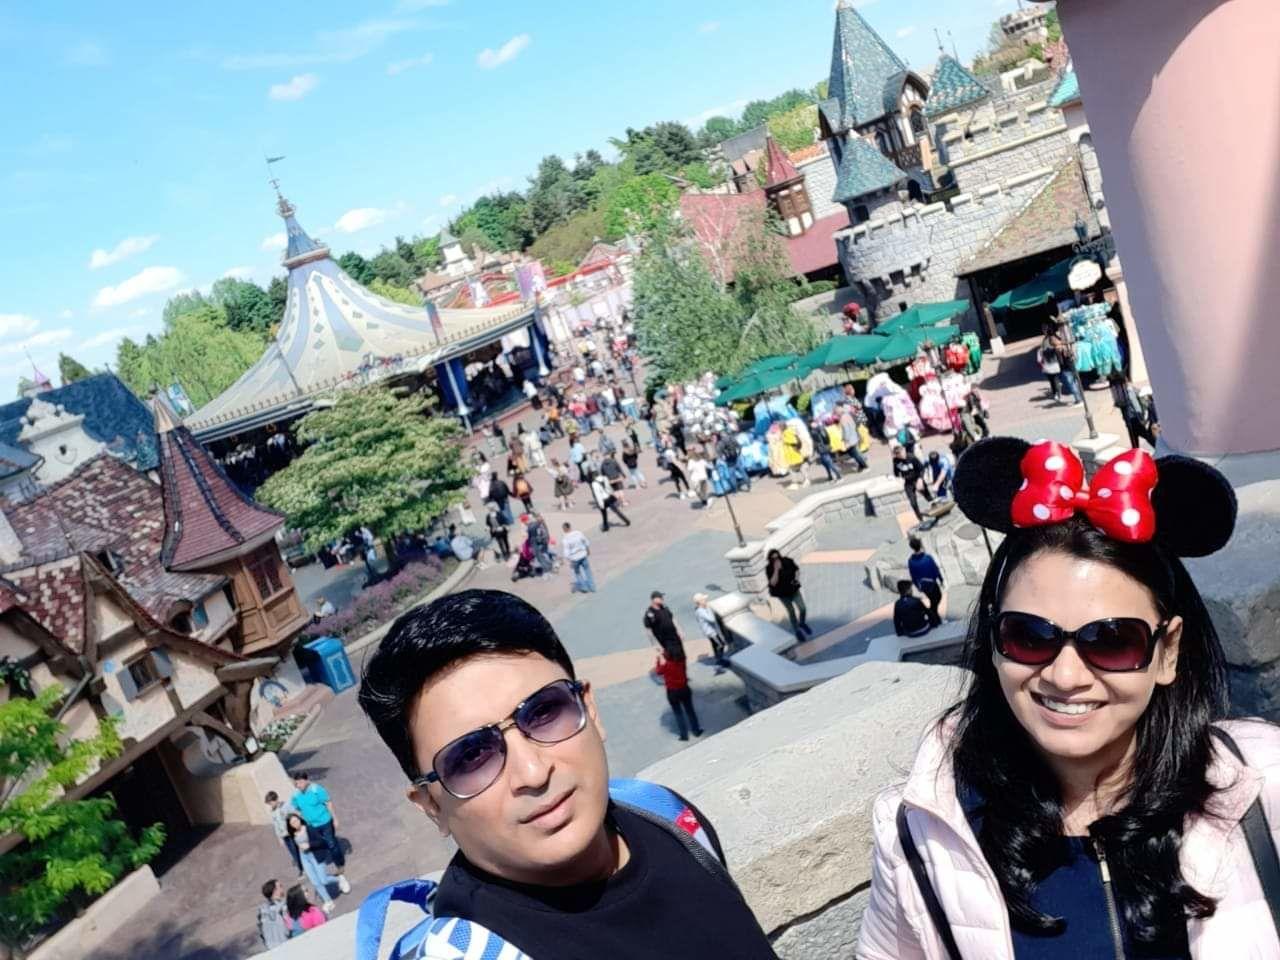 Photo of Disneyland Paris By Sumit Bhargava